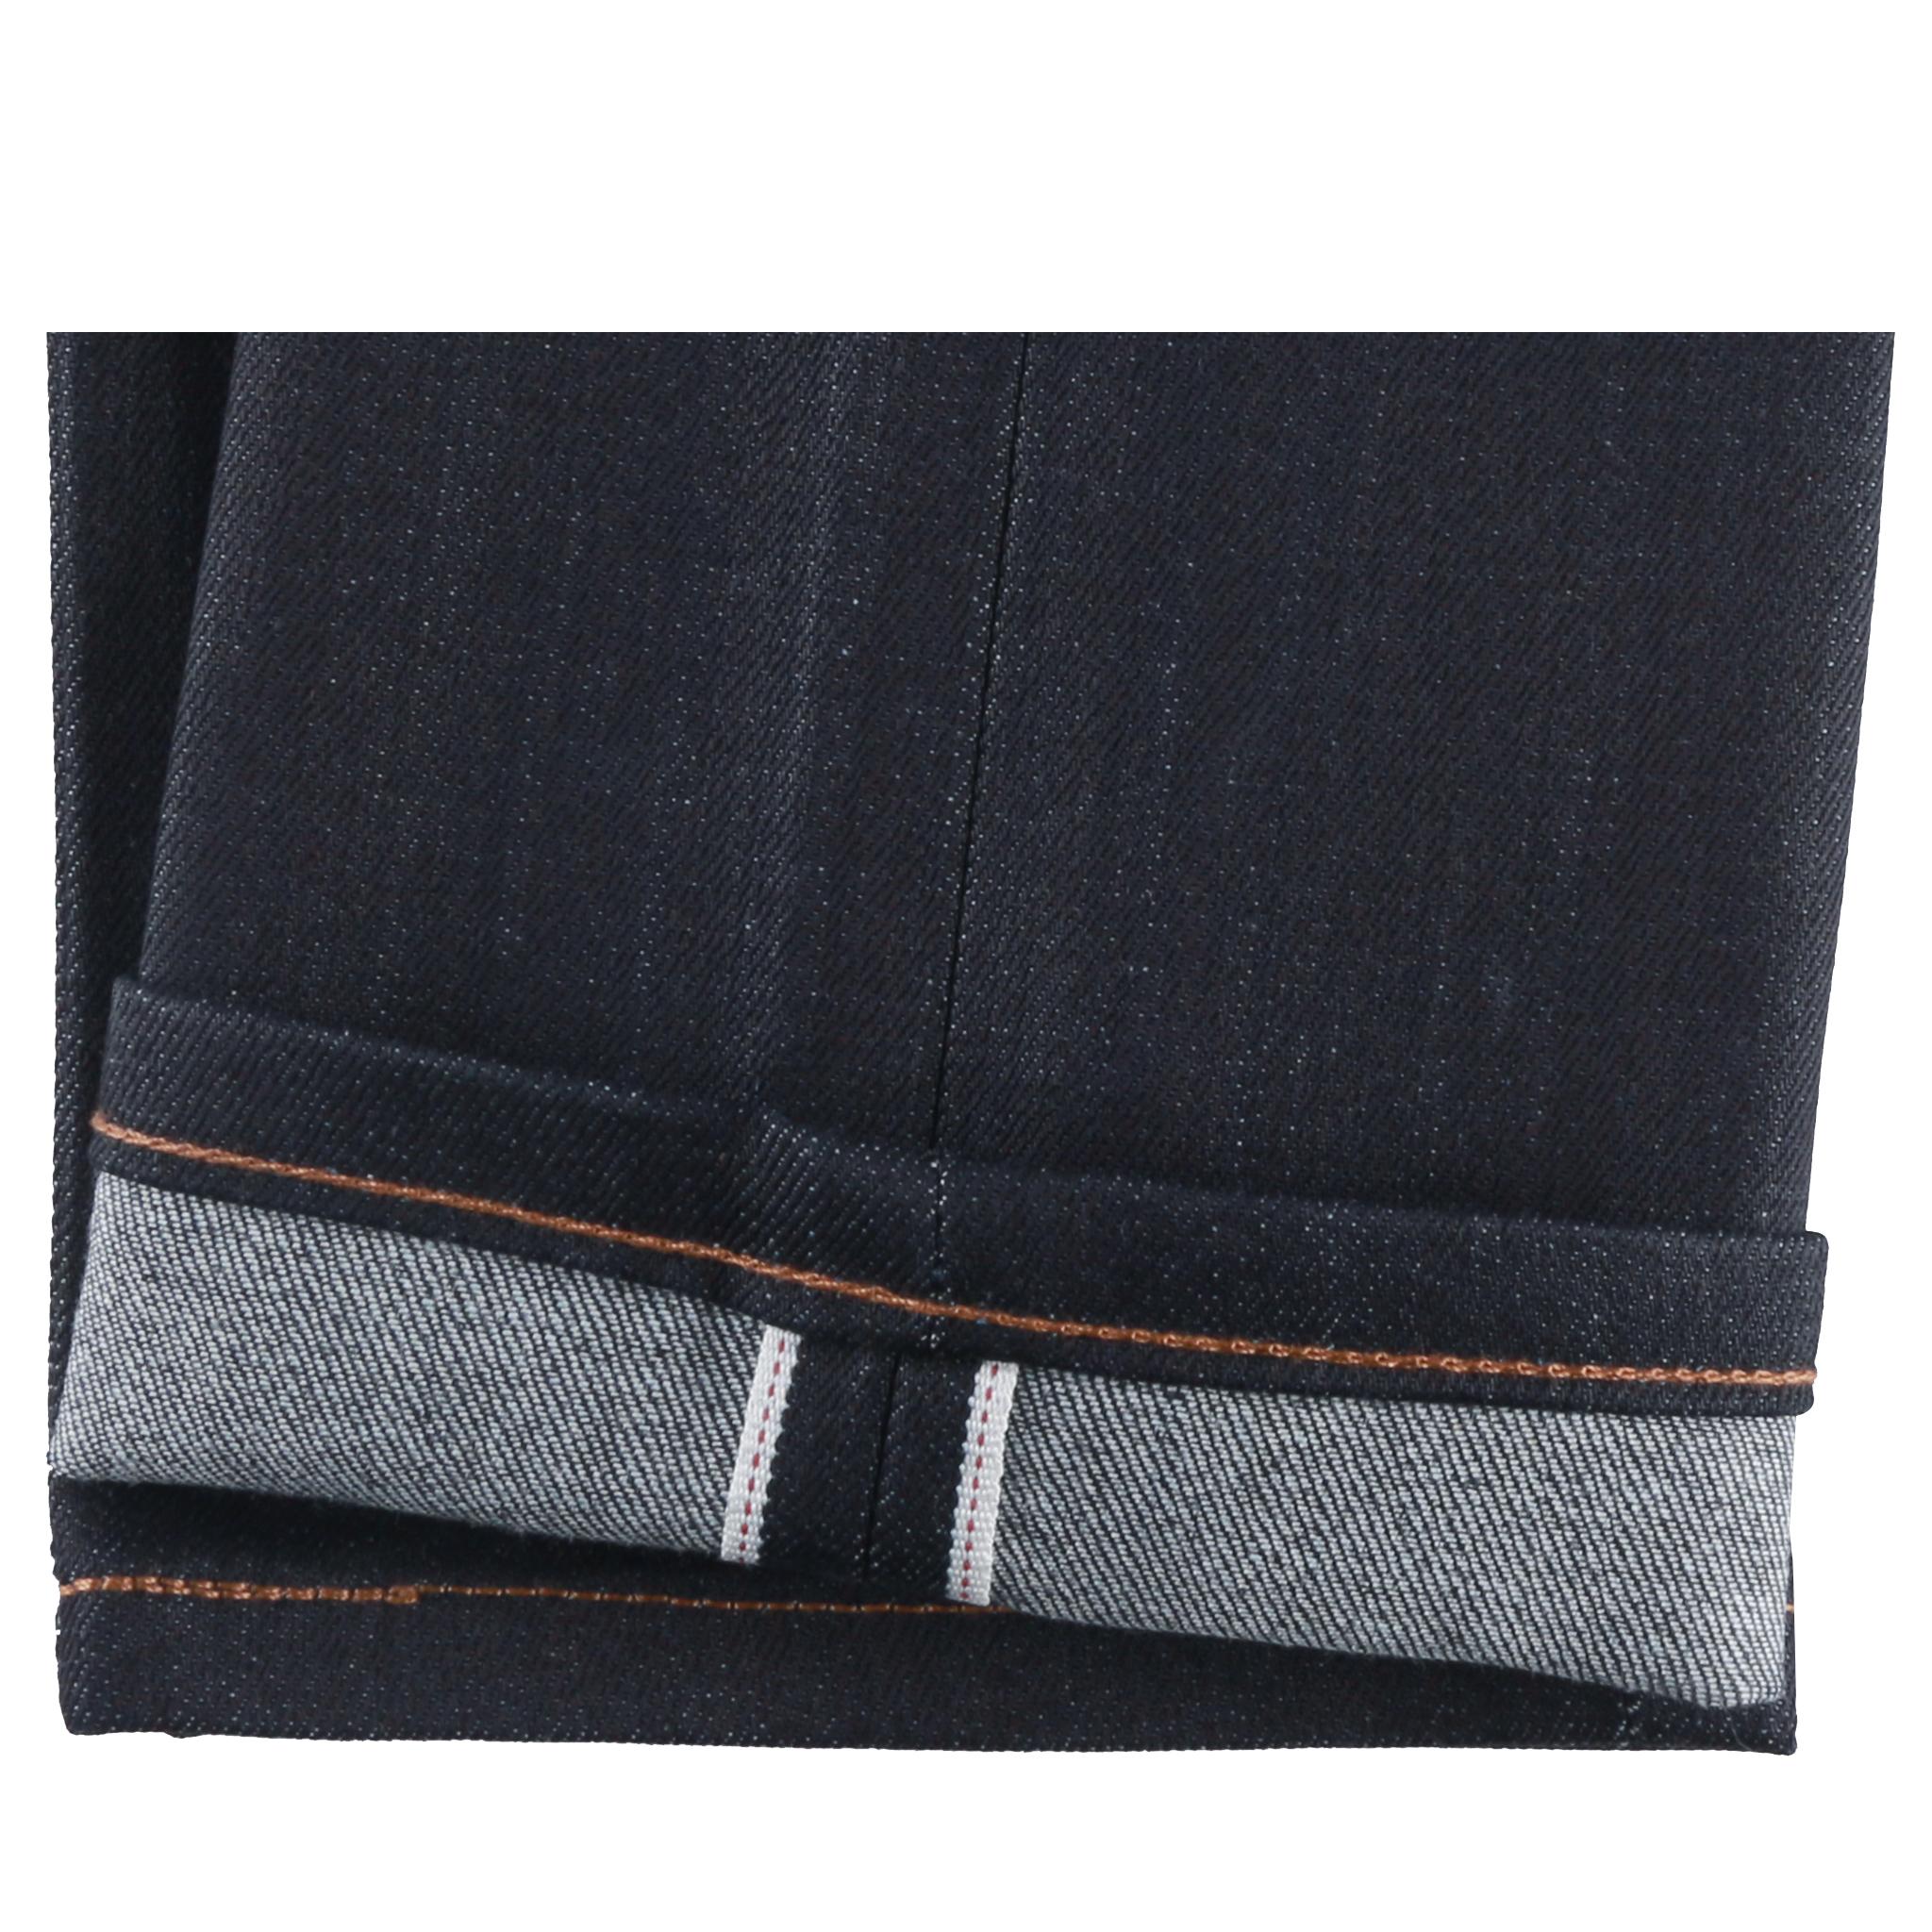 Women's Night Shade Stretch Selvedge Jeans hem